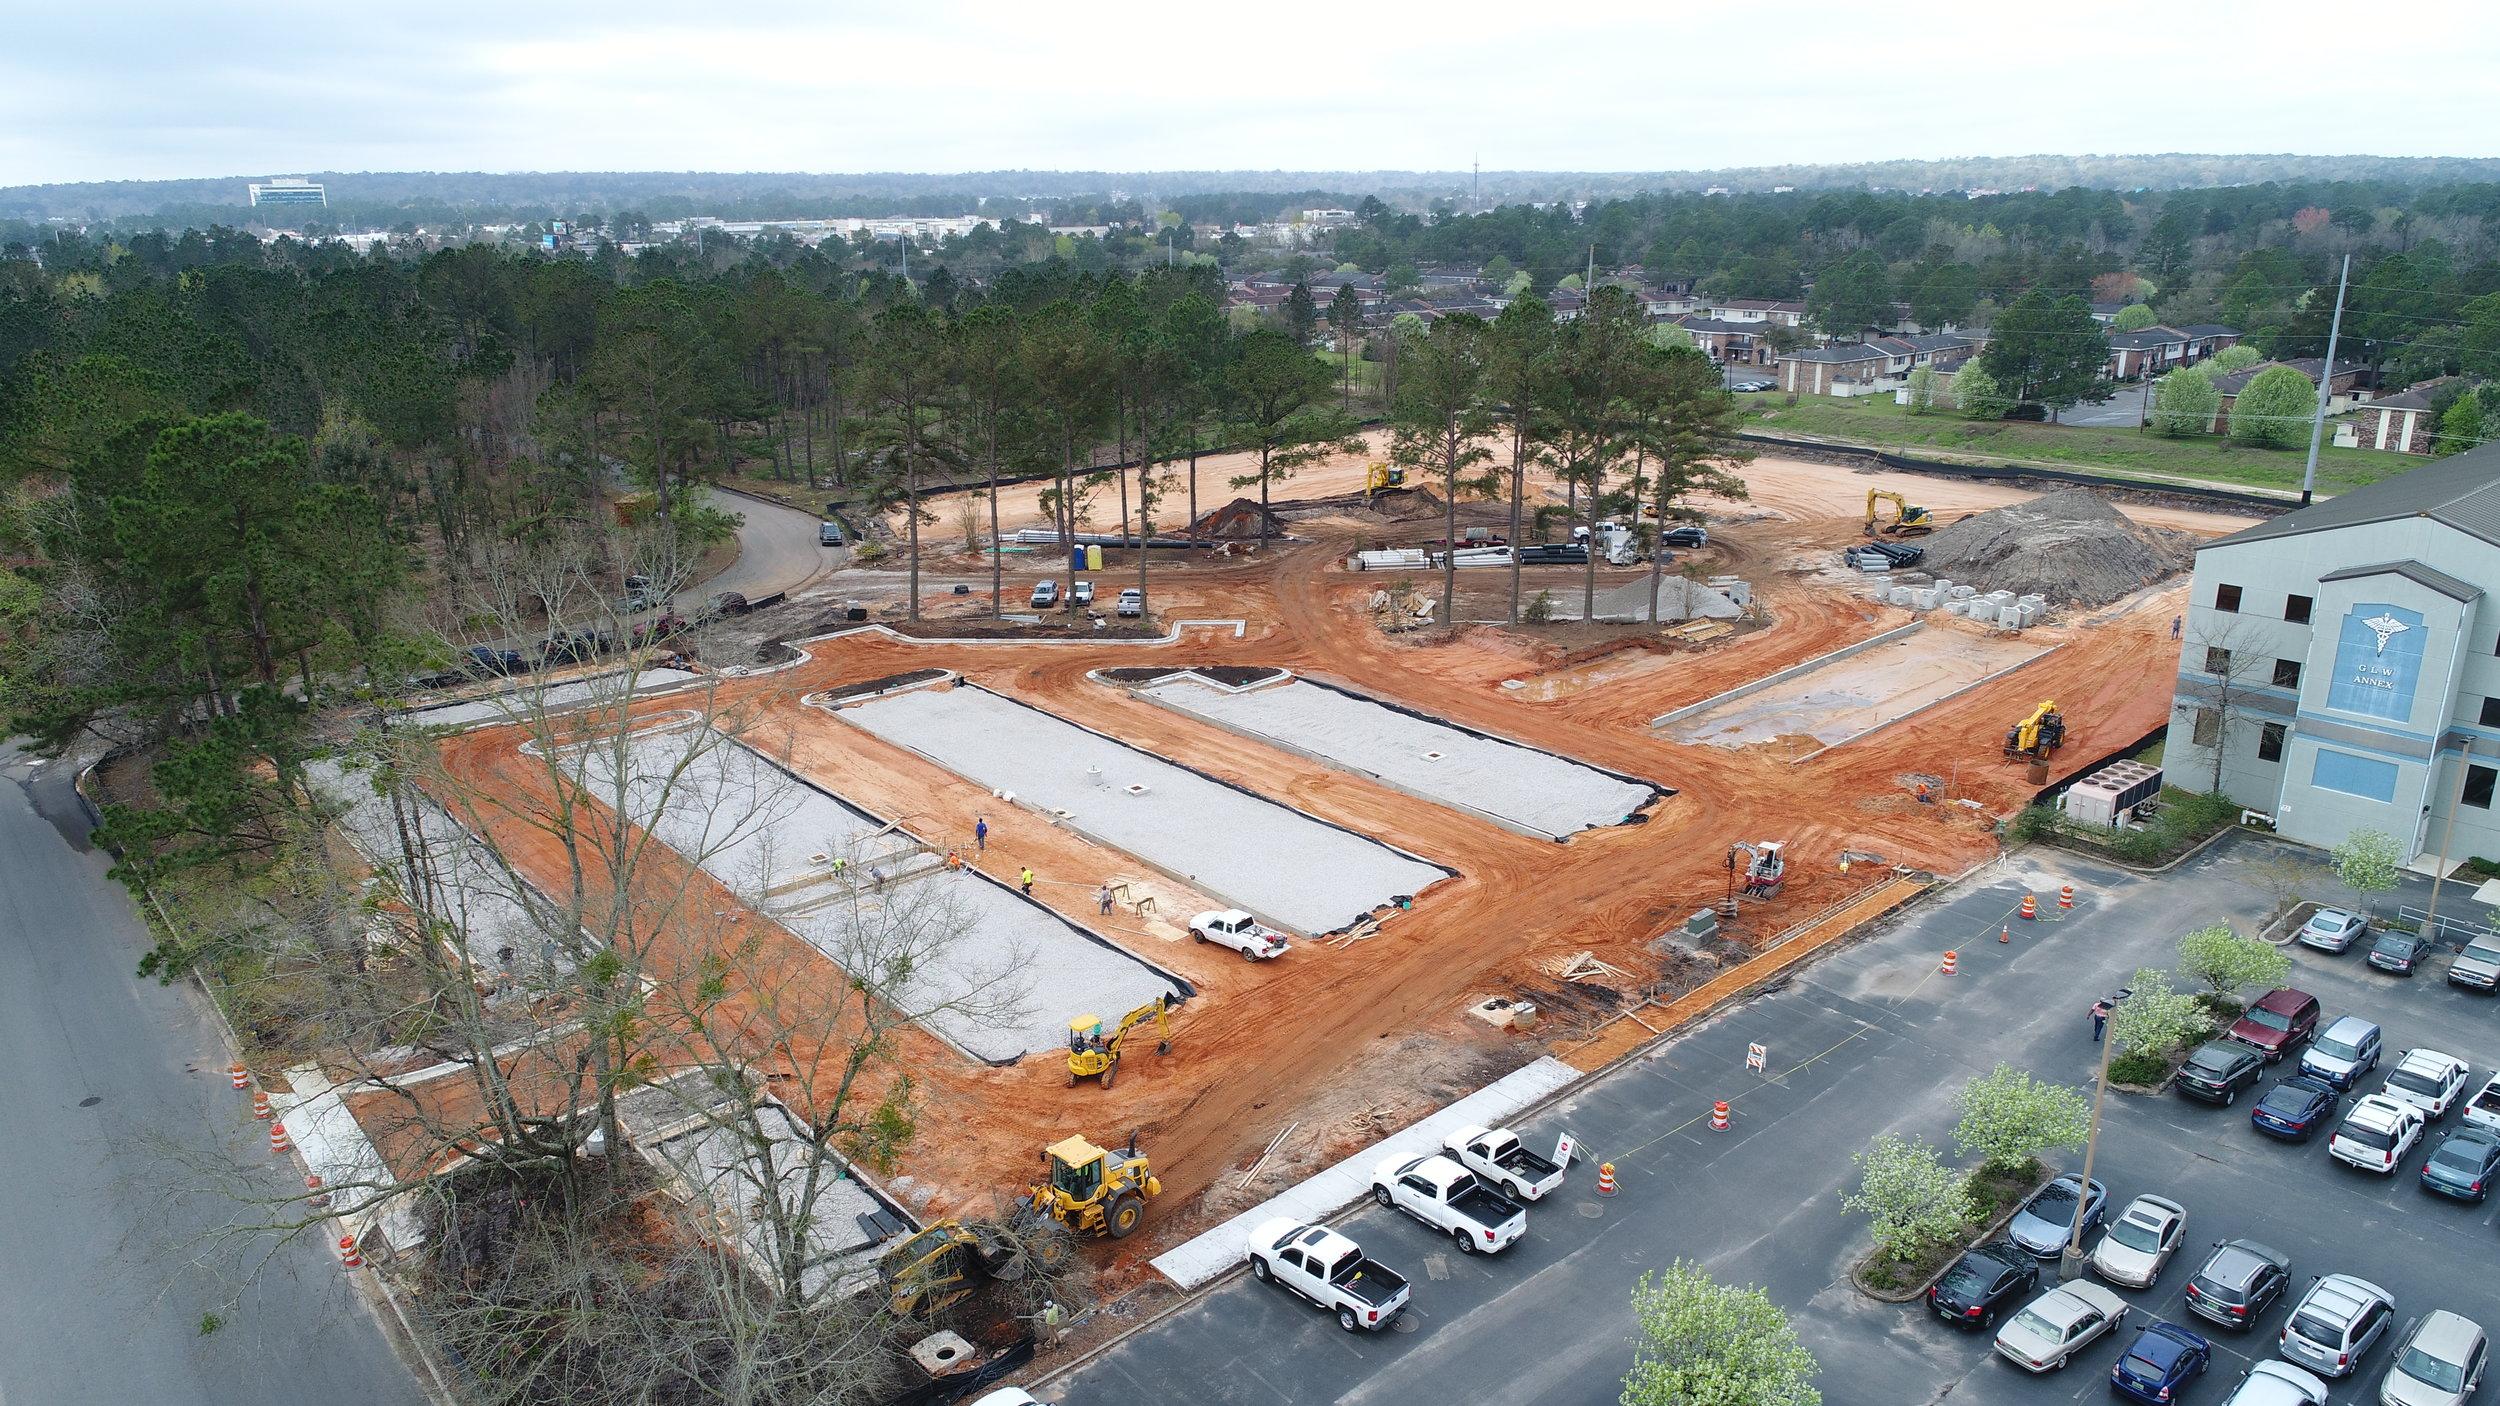 Springhill Medical Center - Delaney Employee Parking Lot  Utilizing Green Infrastructure Solutions